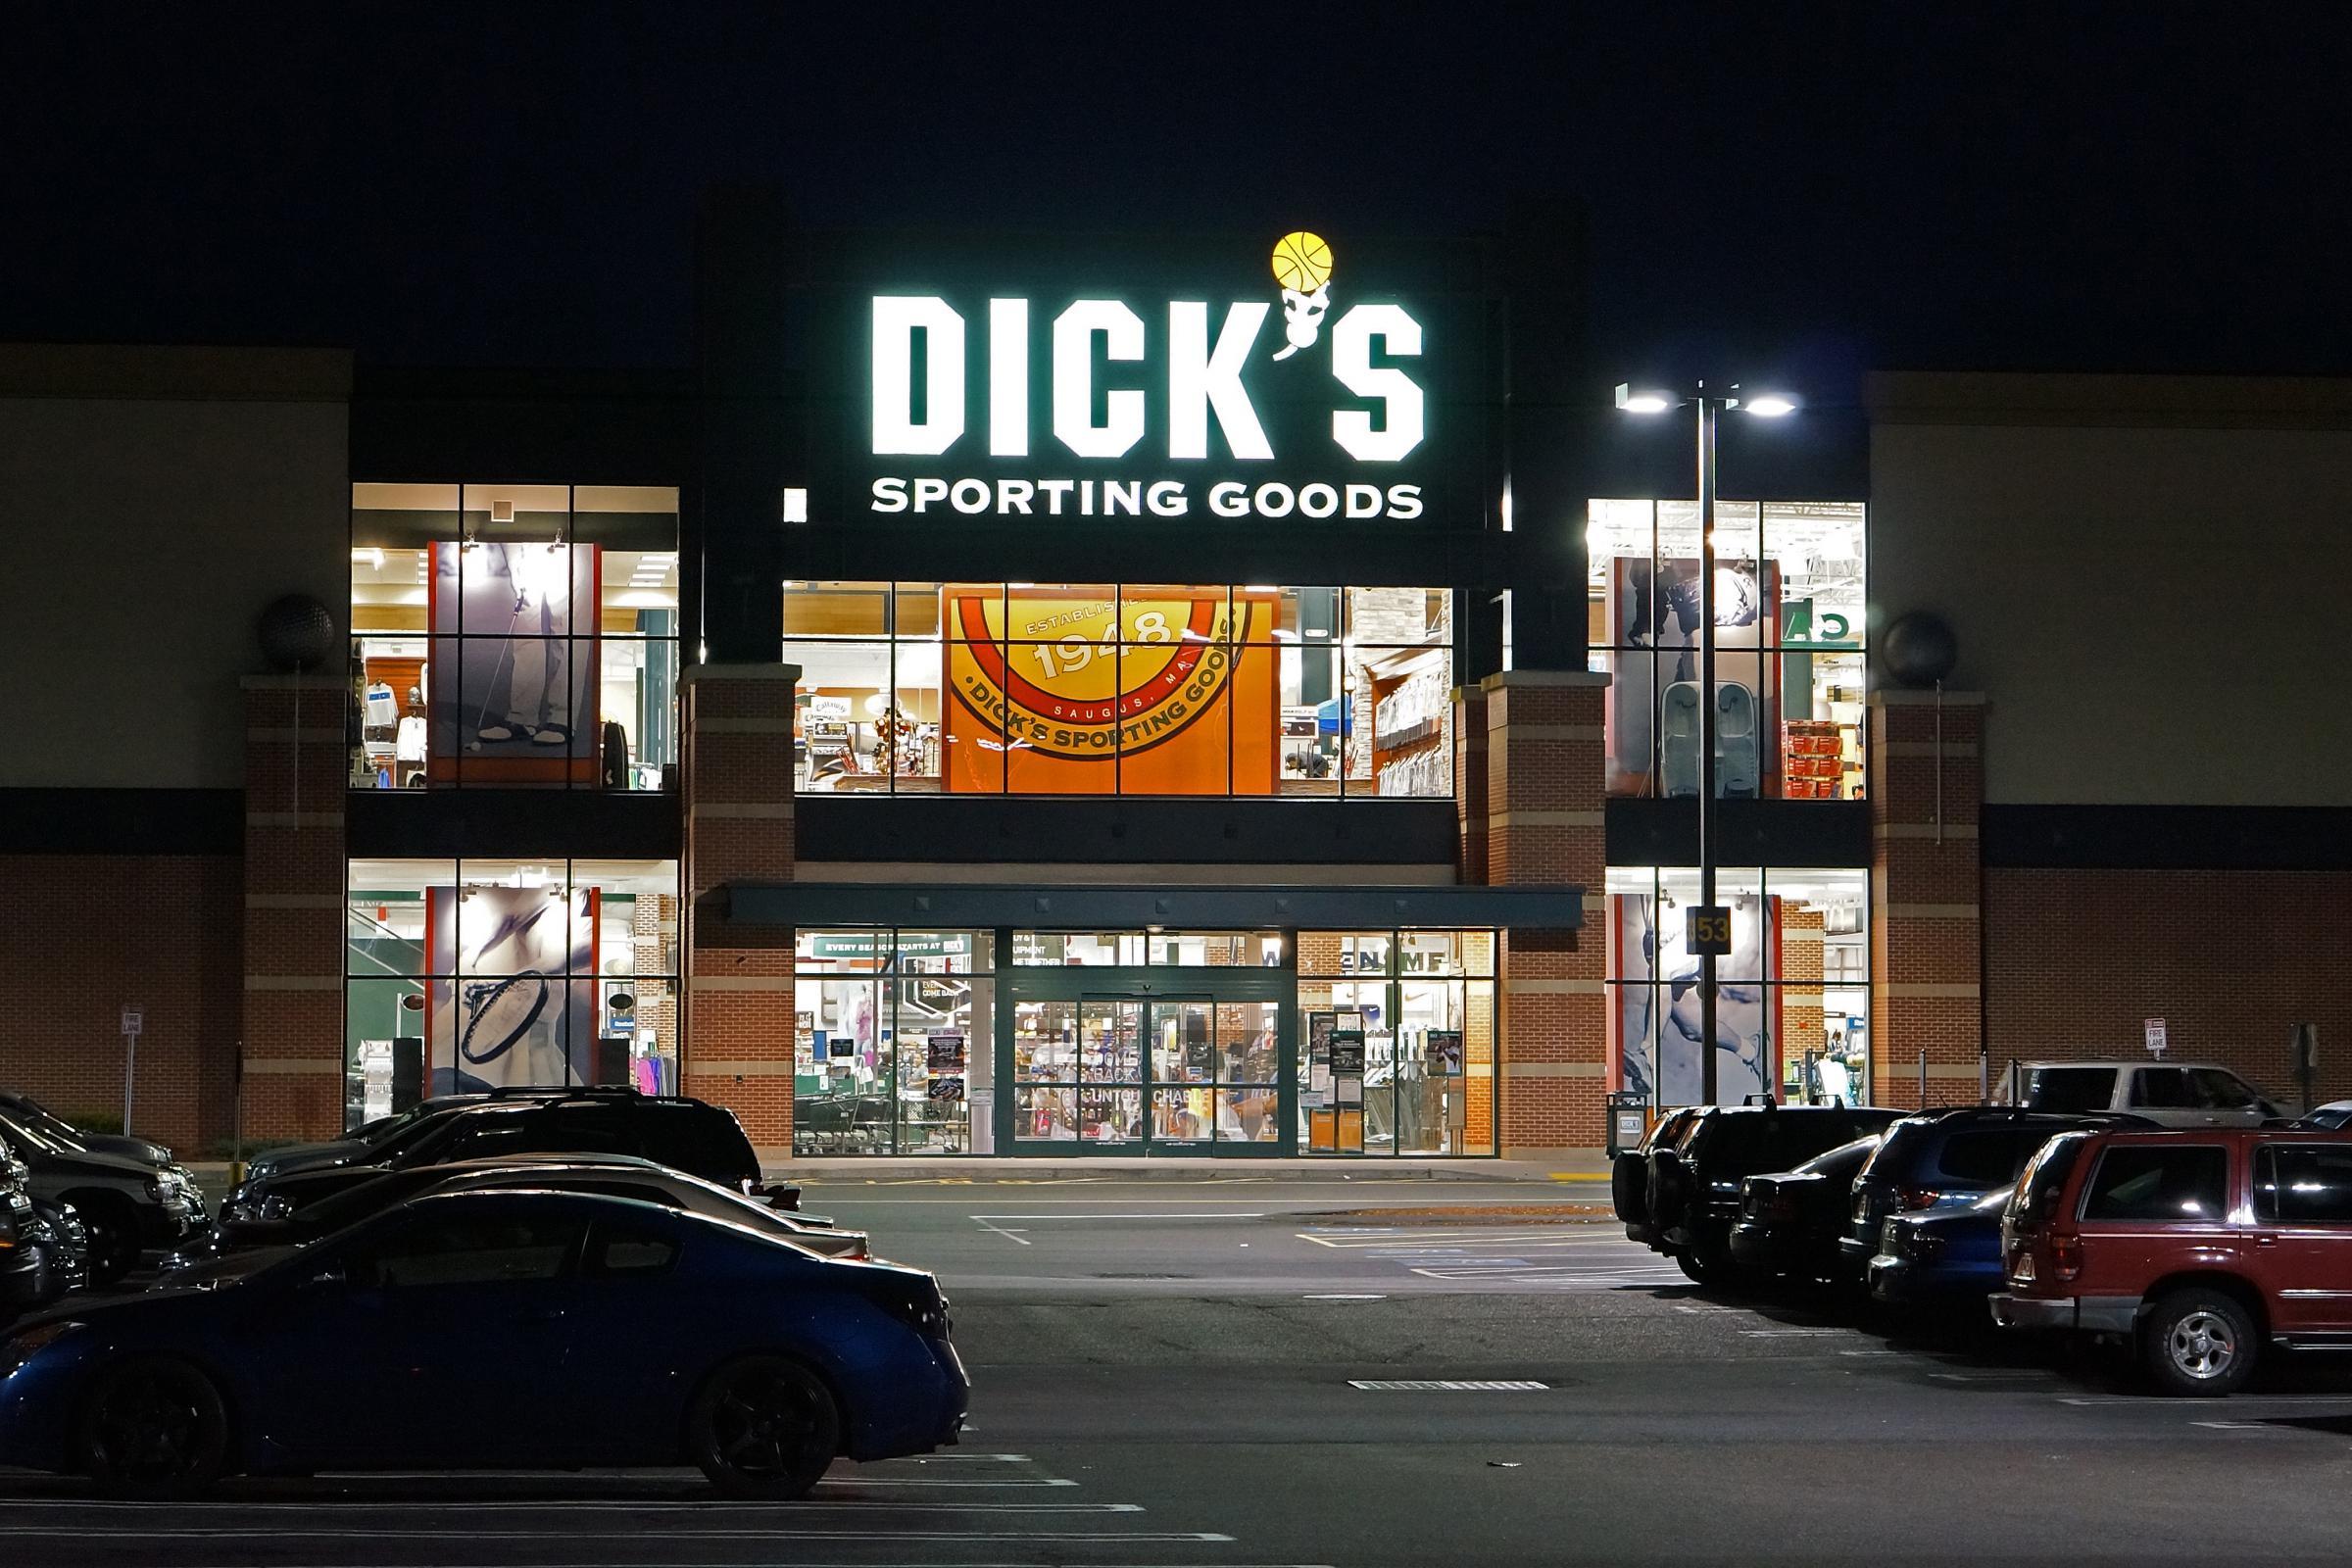 Me! dick goods shotgun sporting authoritative